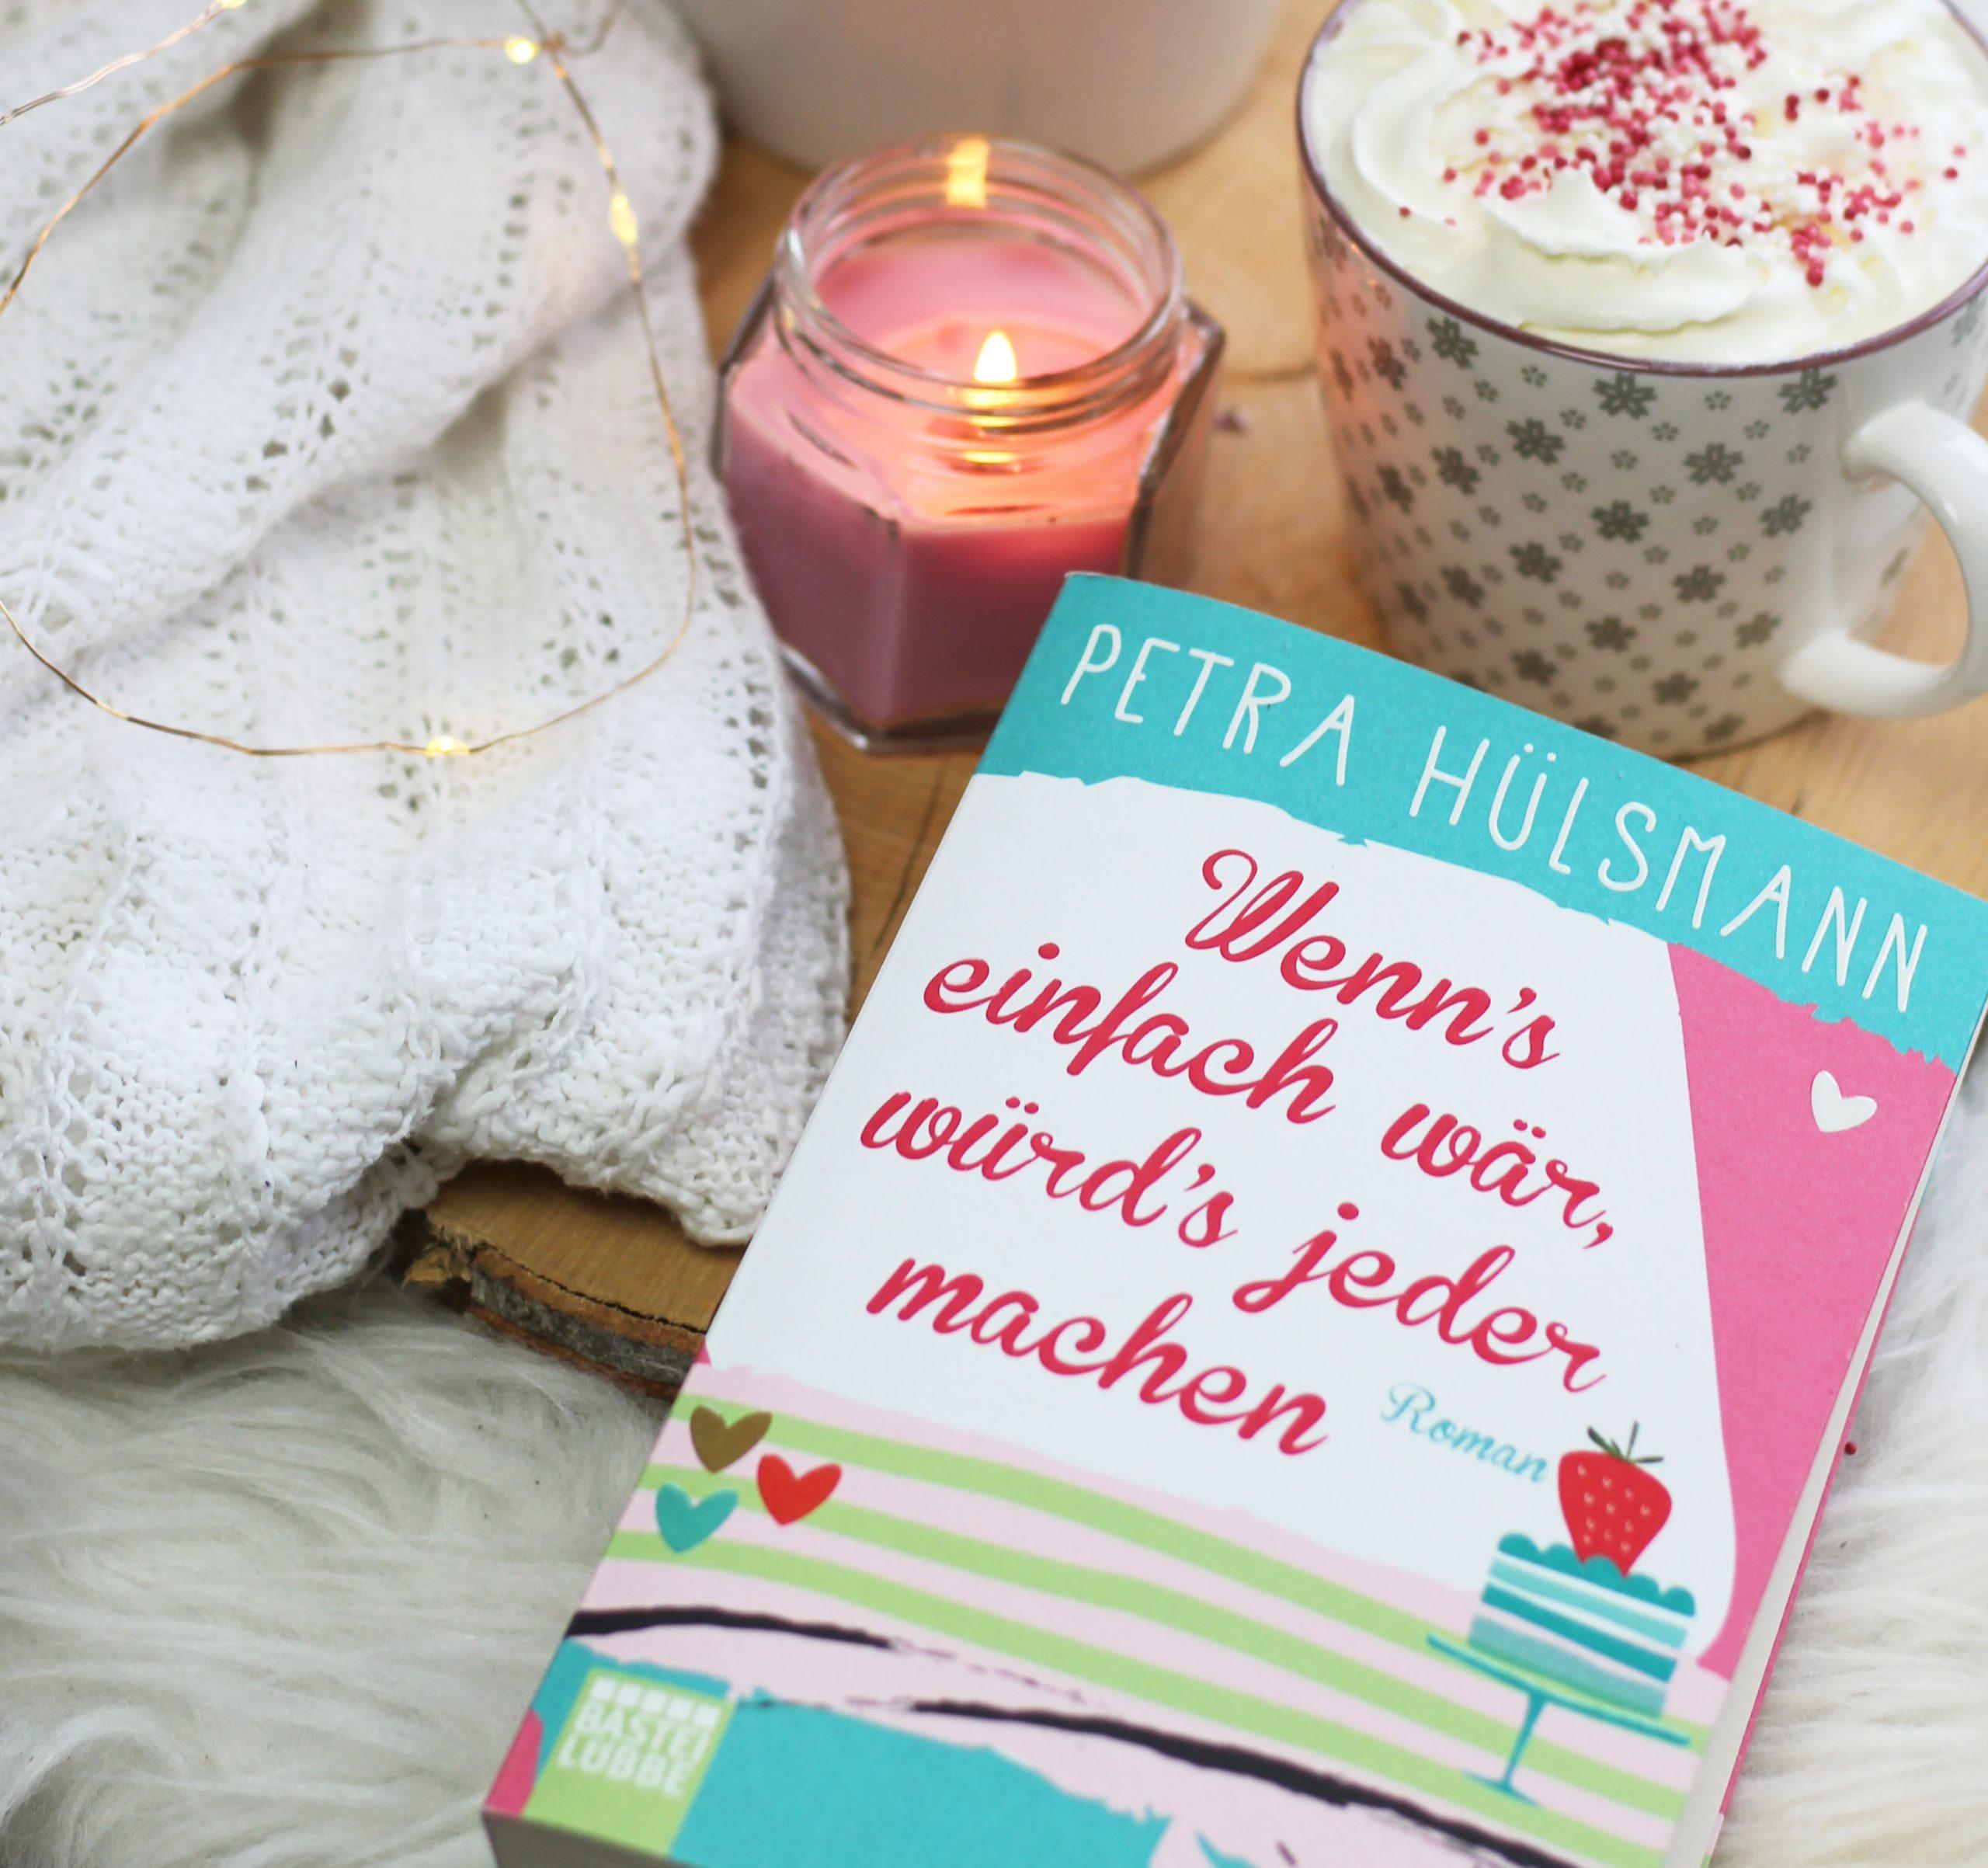 [All about the books] Petra Hülsmann – Wenn's einfach wär, würd's jeder machen